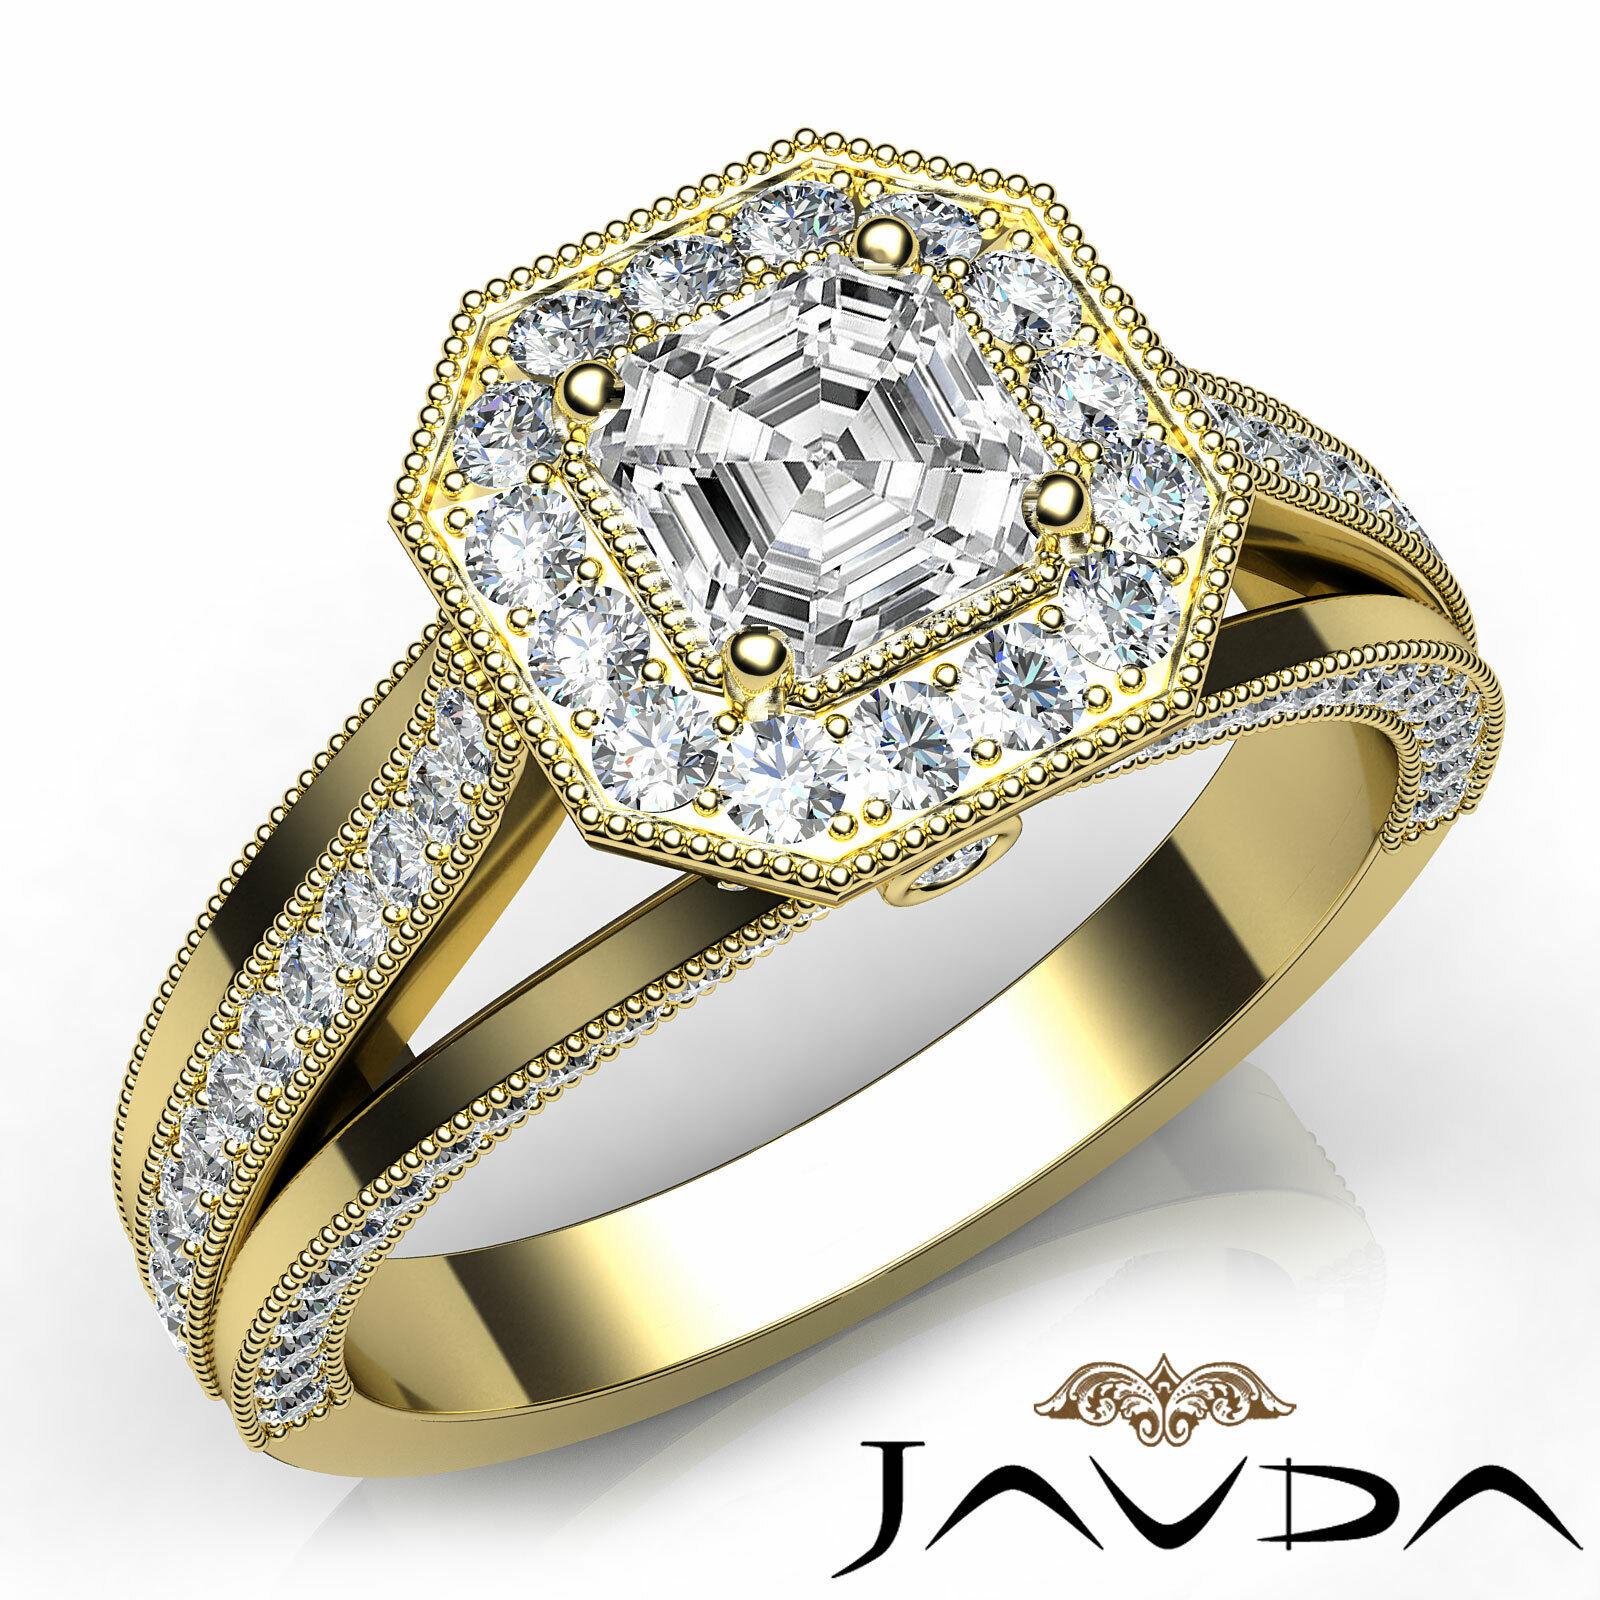 Asscher Diamond Engagement Halo Pave Set Ring GIA G VVS2 18k Yellow Gold 1.4Ct